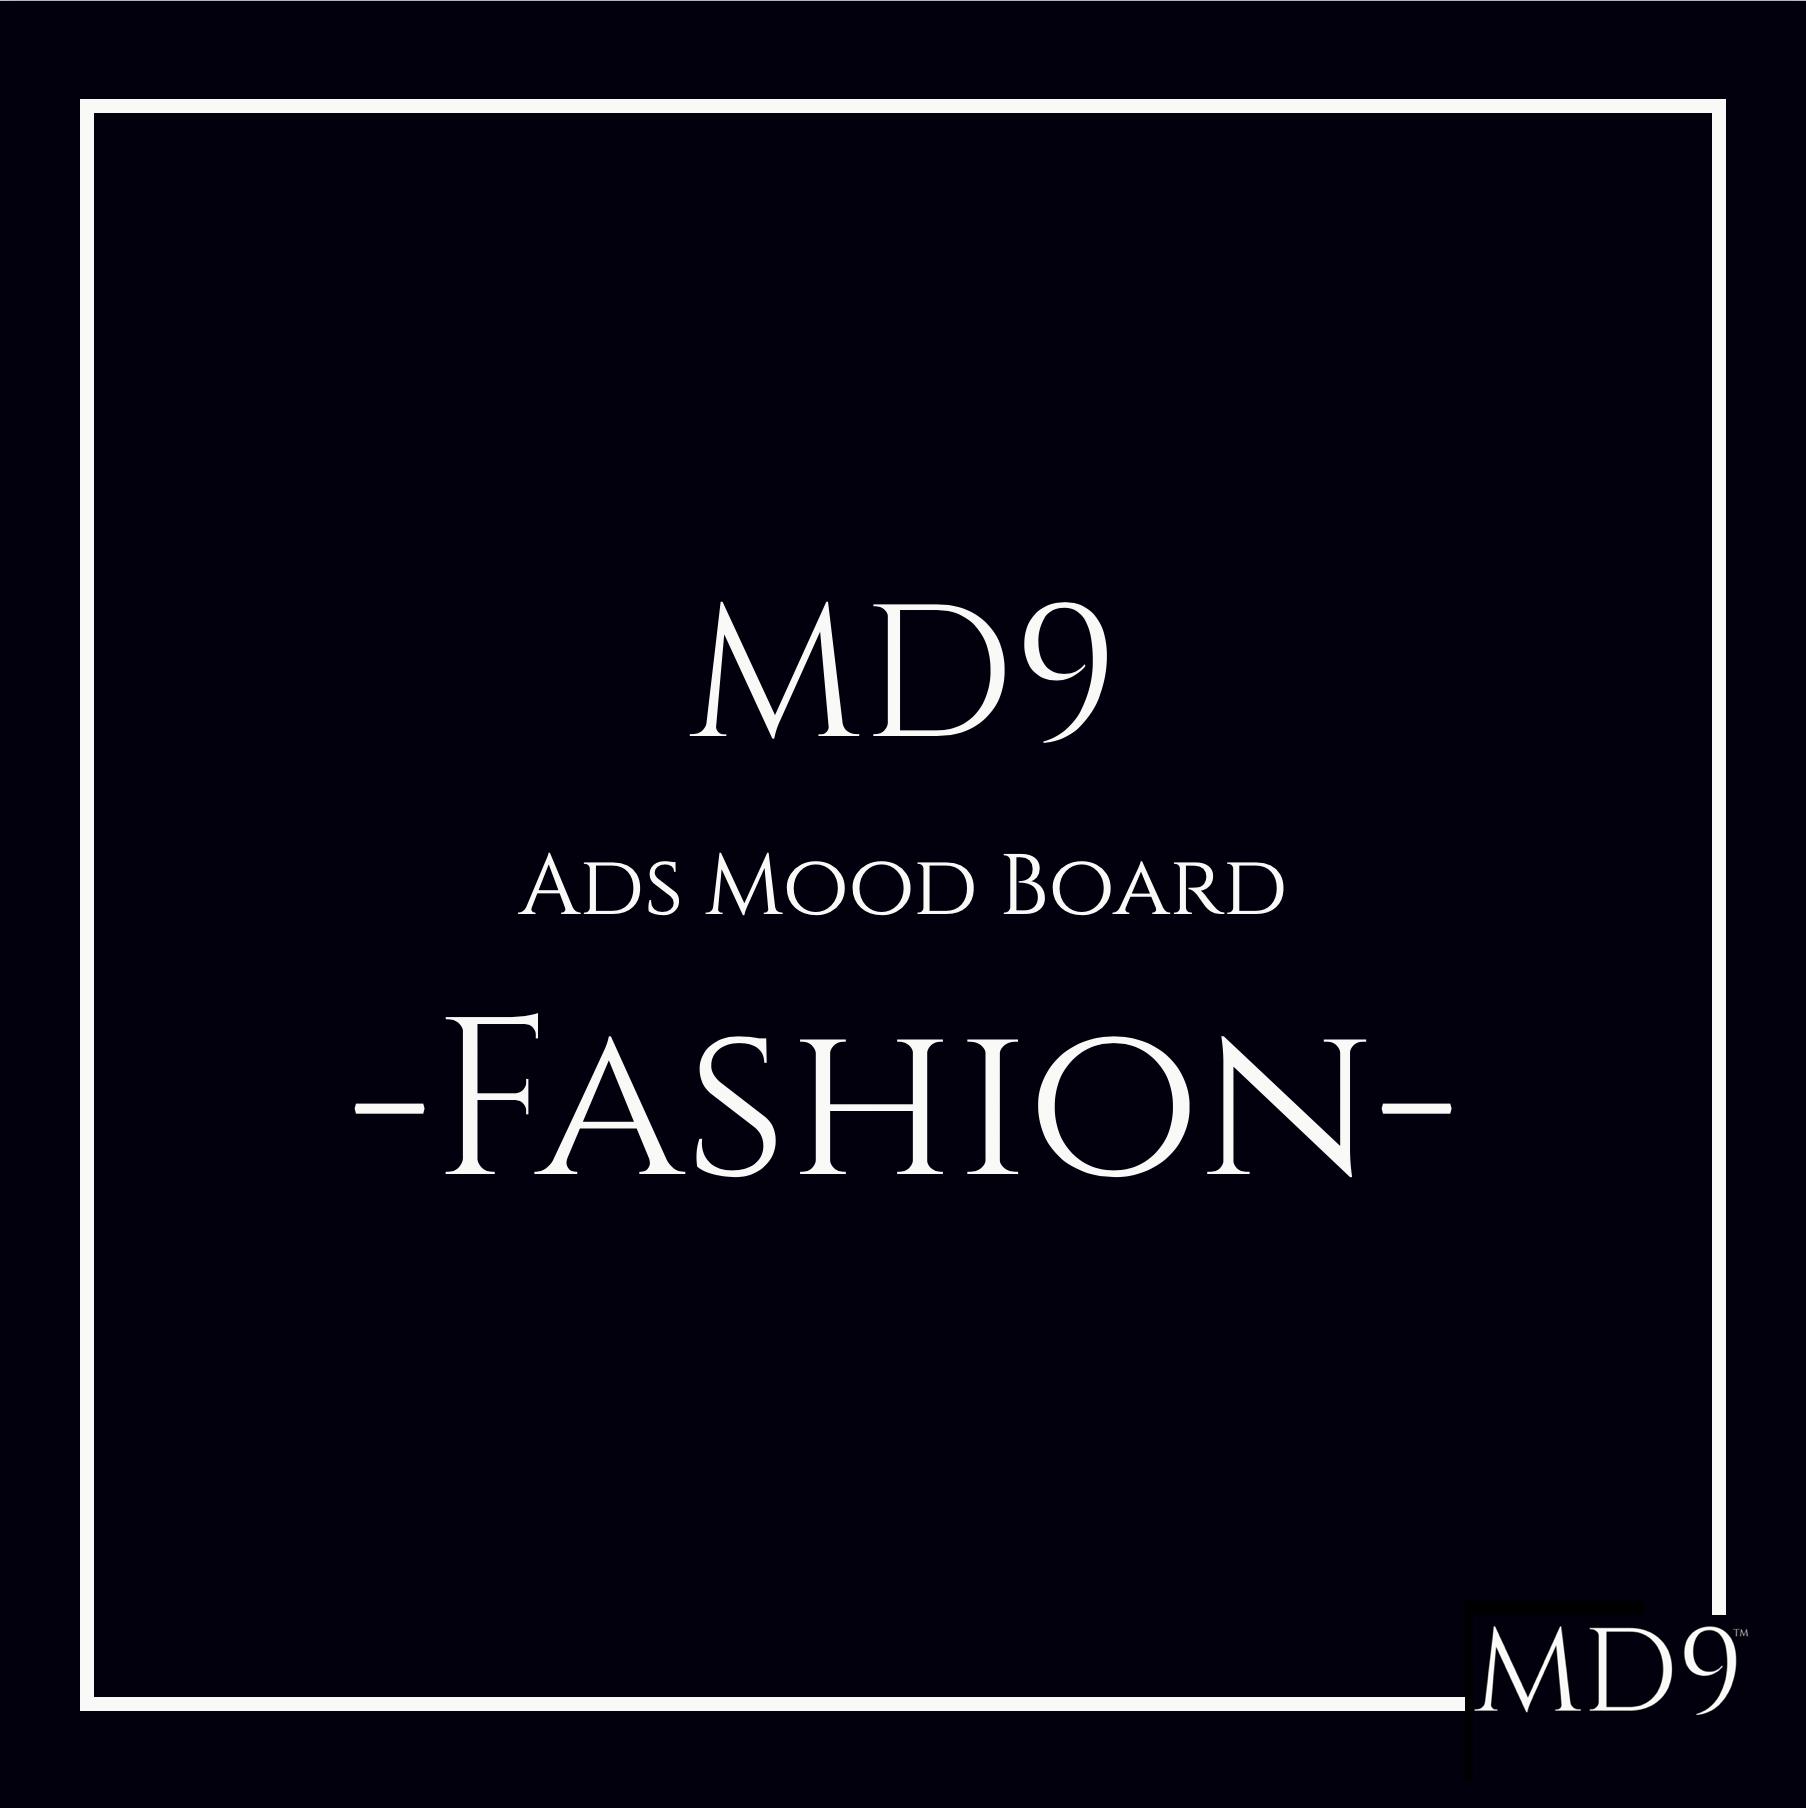 MD9's Ads Mood Board – Fashion